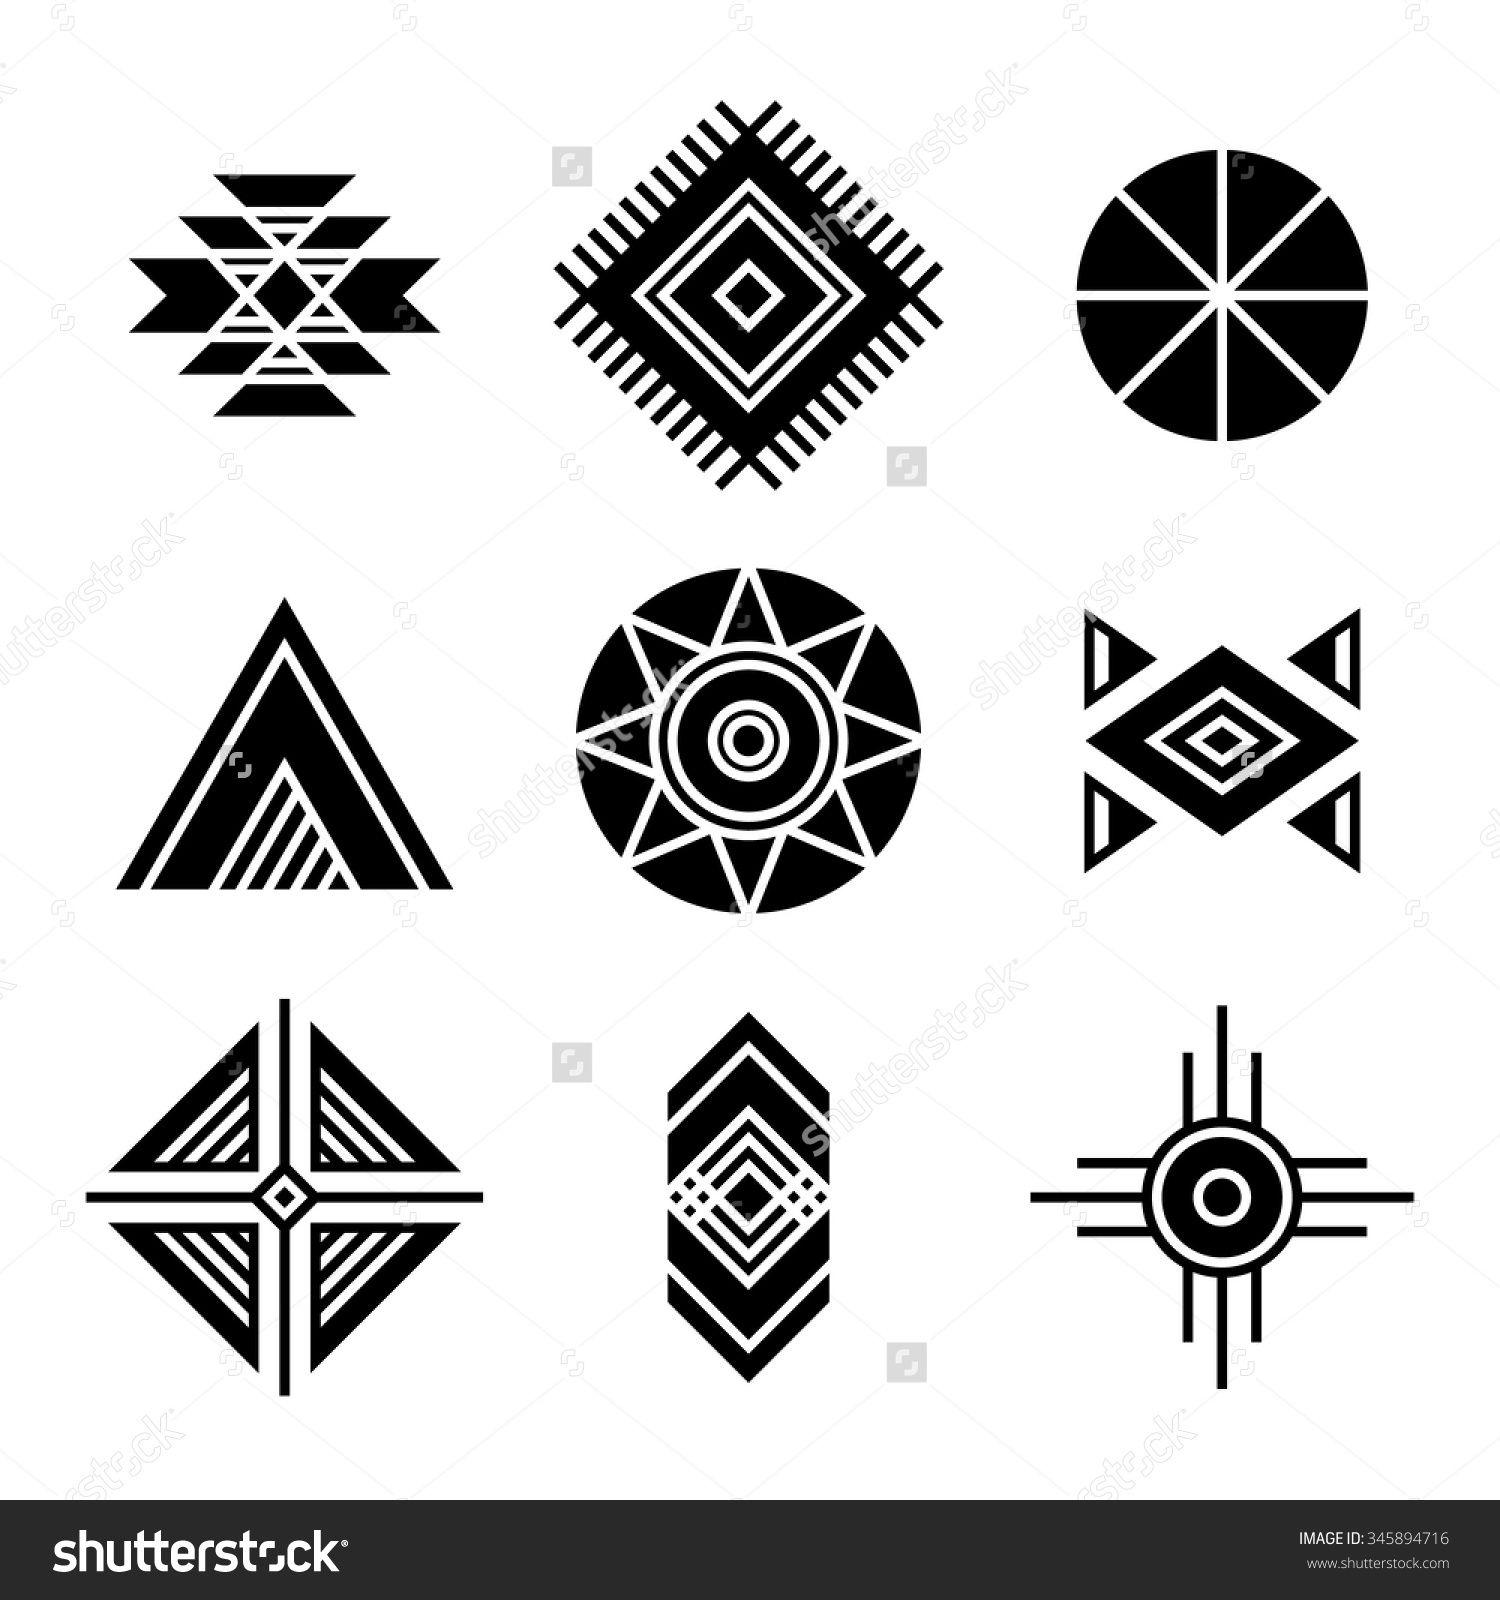 Yaqui tribe symbols images symbol and sign ideas cherokee indian tribe symbols choice image symbol and sign ideas native symbols tatu ideas pinterest native biocorpaavc